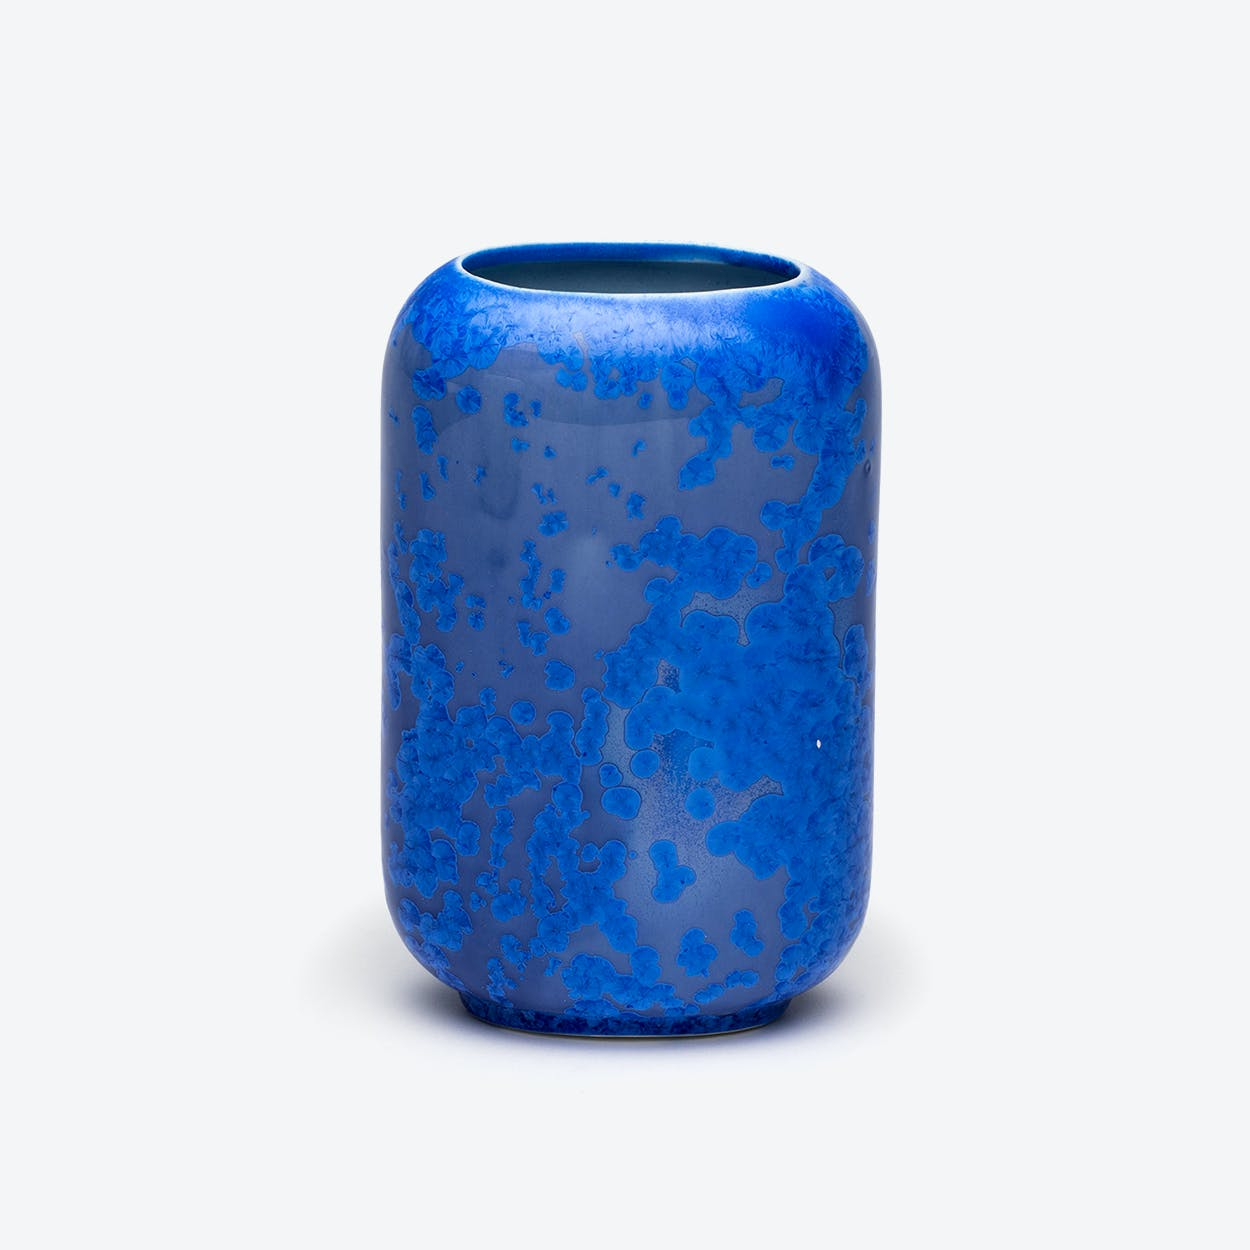 Porcelain Crystalline Vase - Sapphire